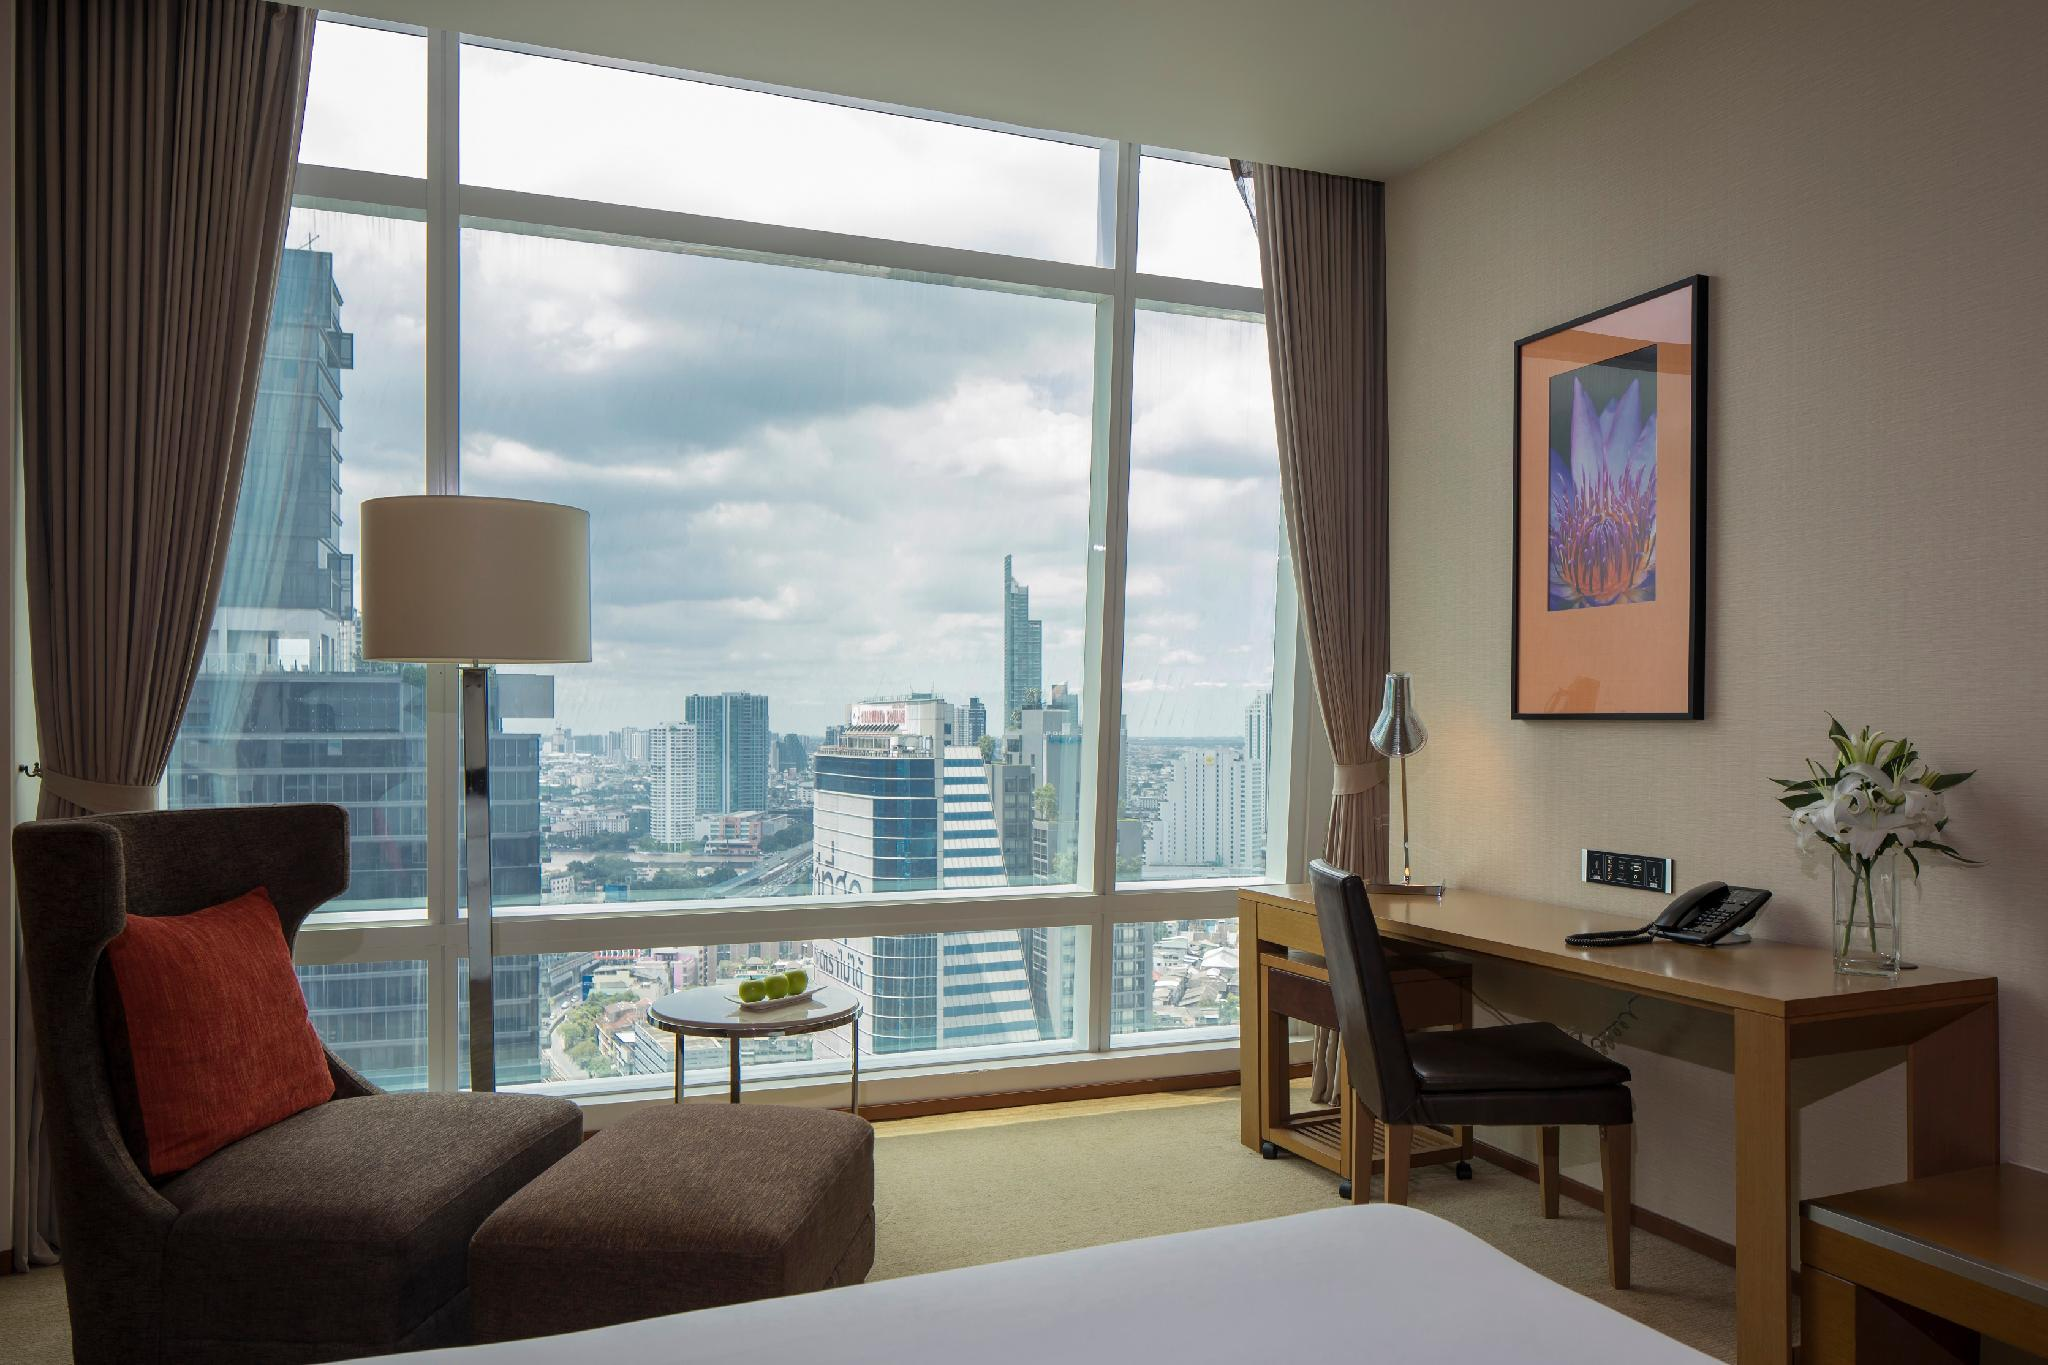 Eastin Grand Hotel Sathorn Bangkok Thailand Preise 2020 Agoda